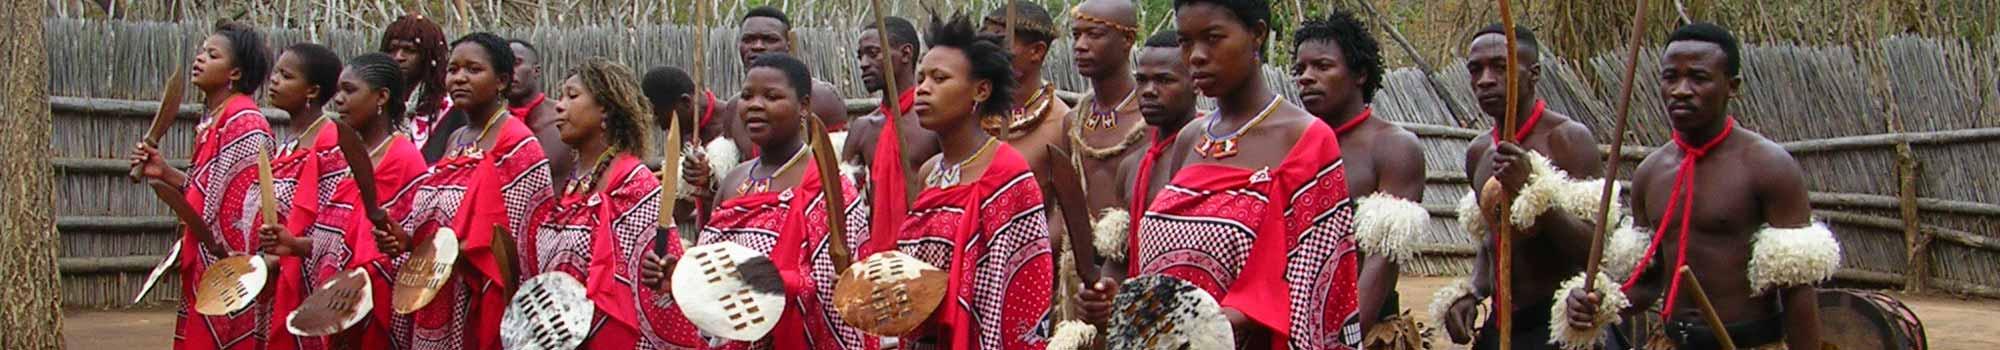 Swaziland Tours